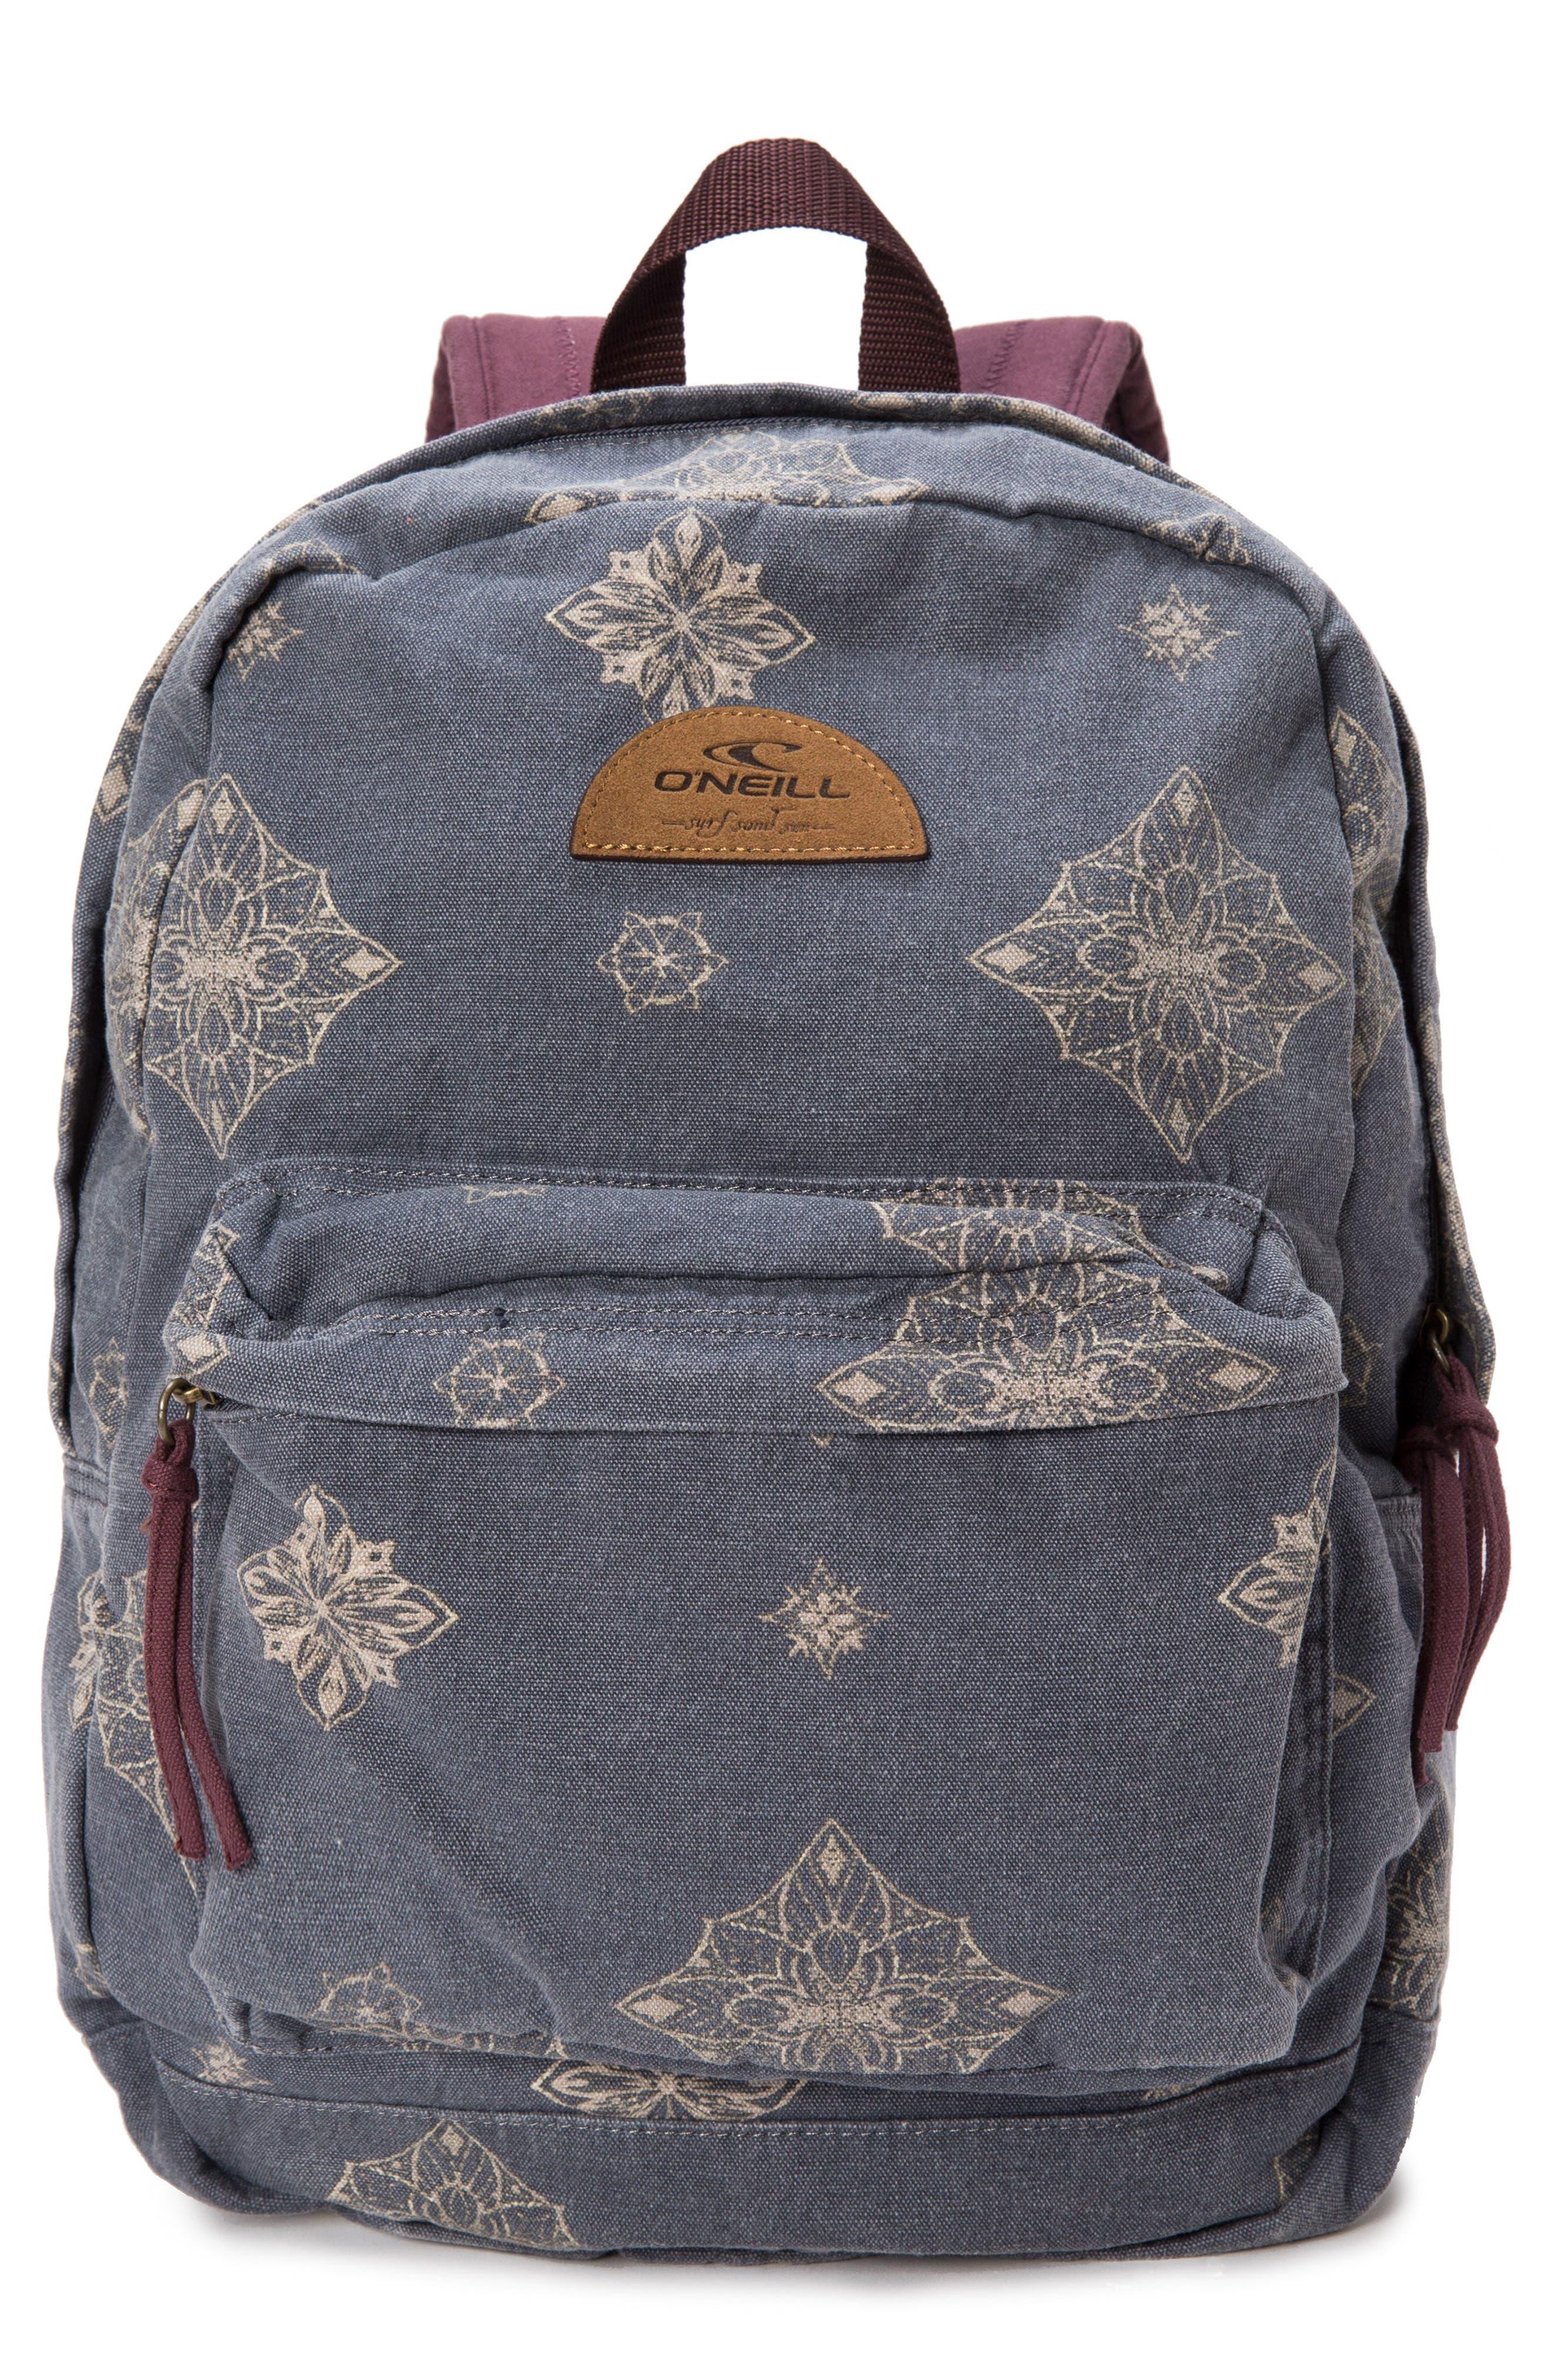 Beachblazer Print Canvas Backpack,                         Main,                         color, Obre Blue